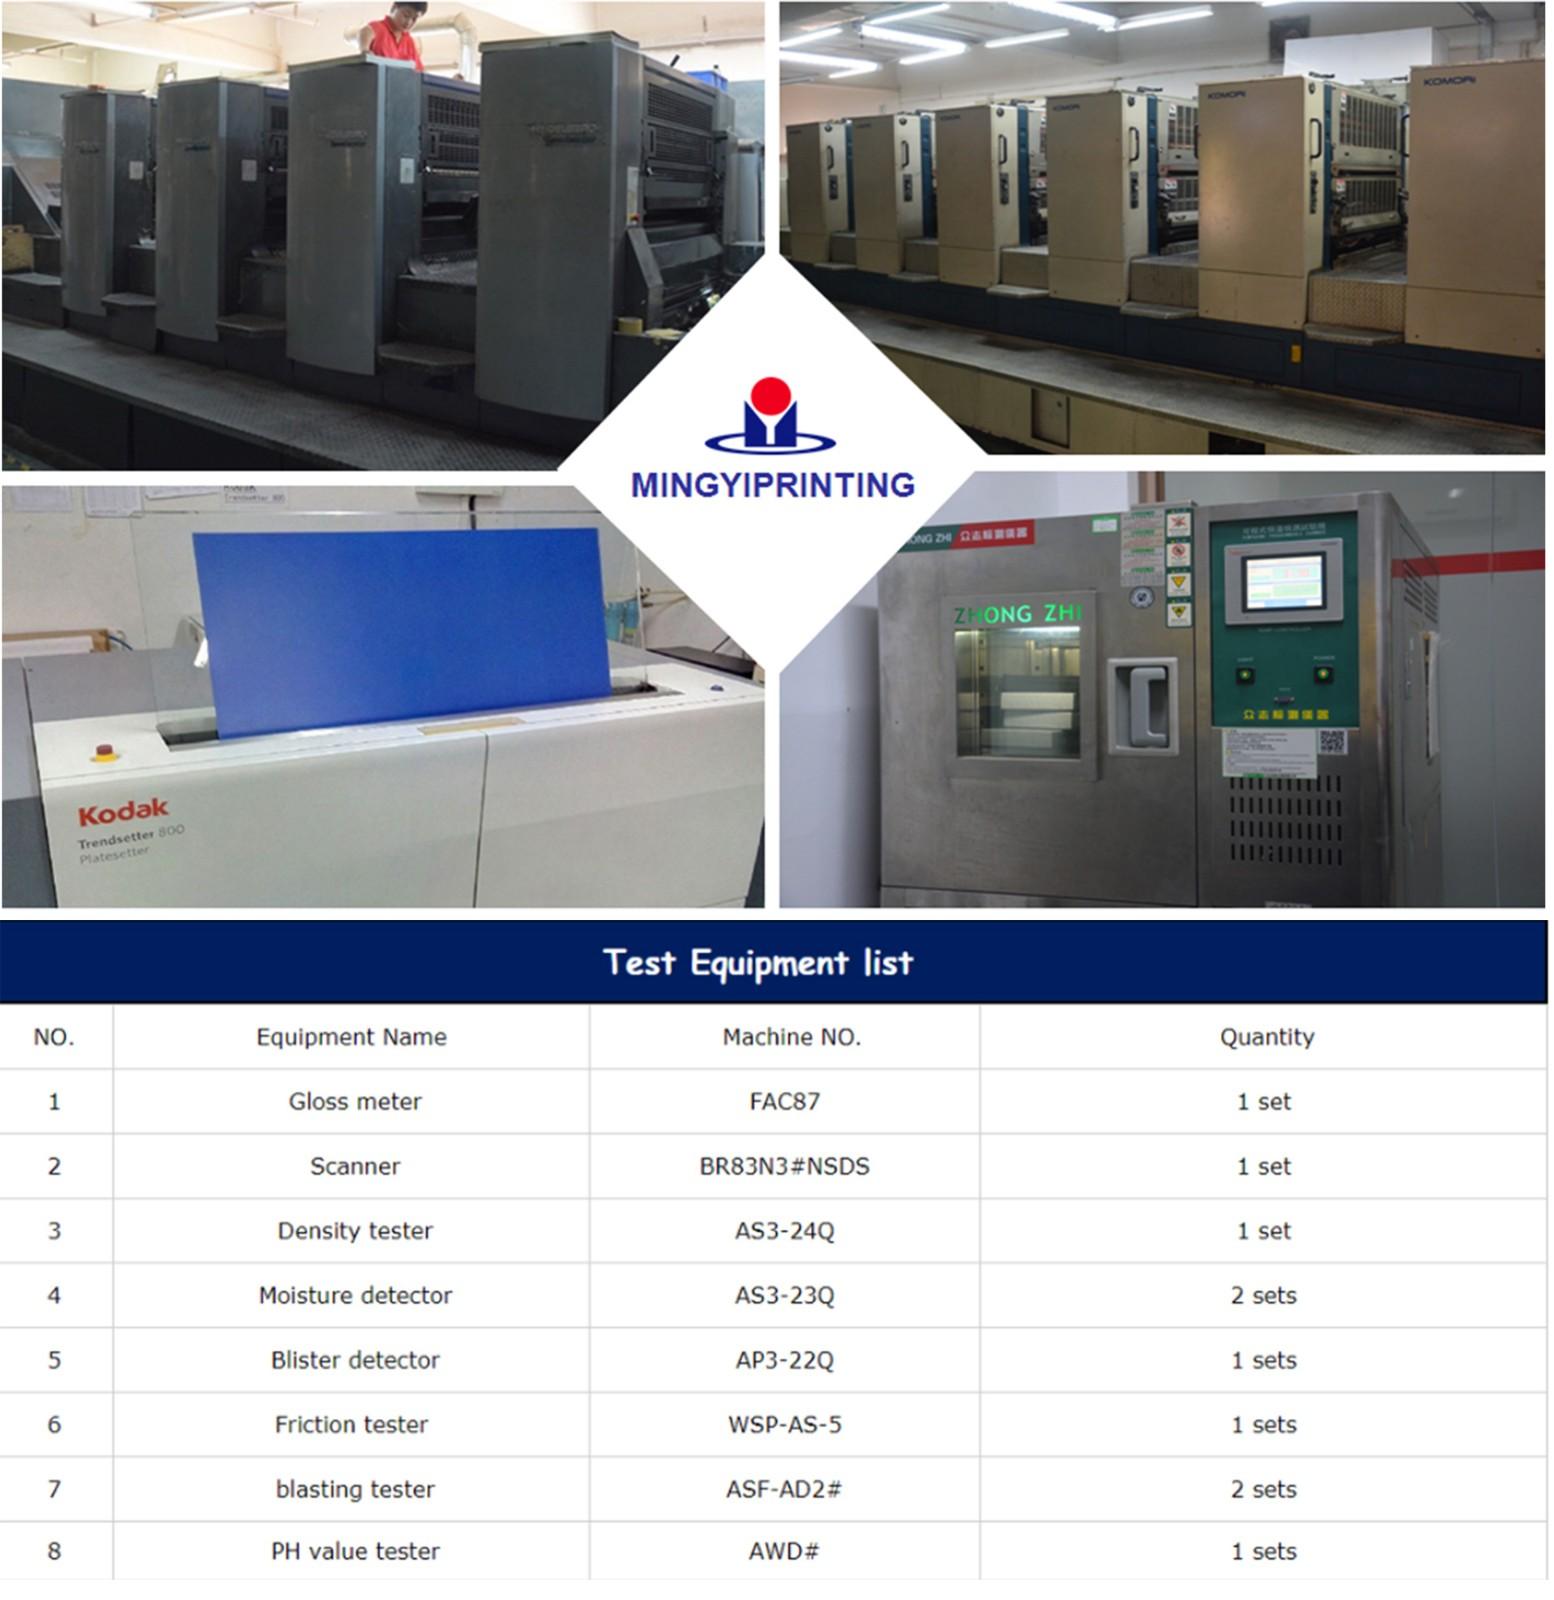 product-Mingyi Printing-Customized bubble pack for documentcardfile-img-1